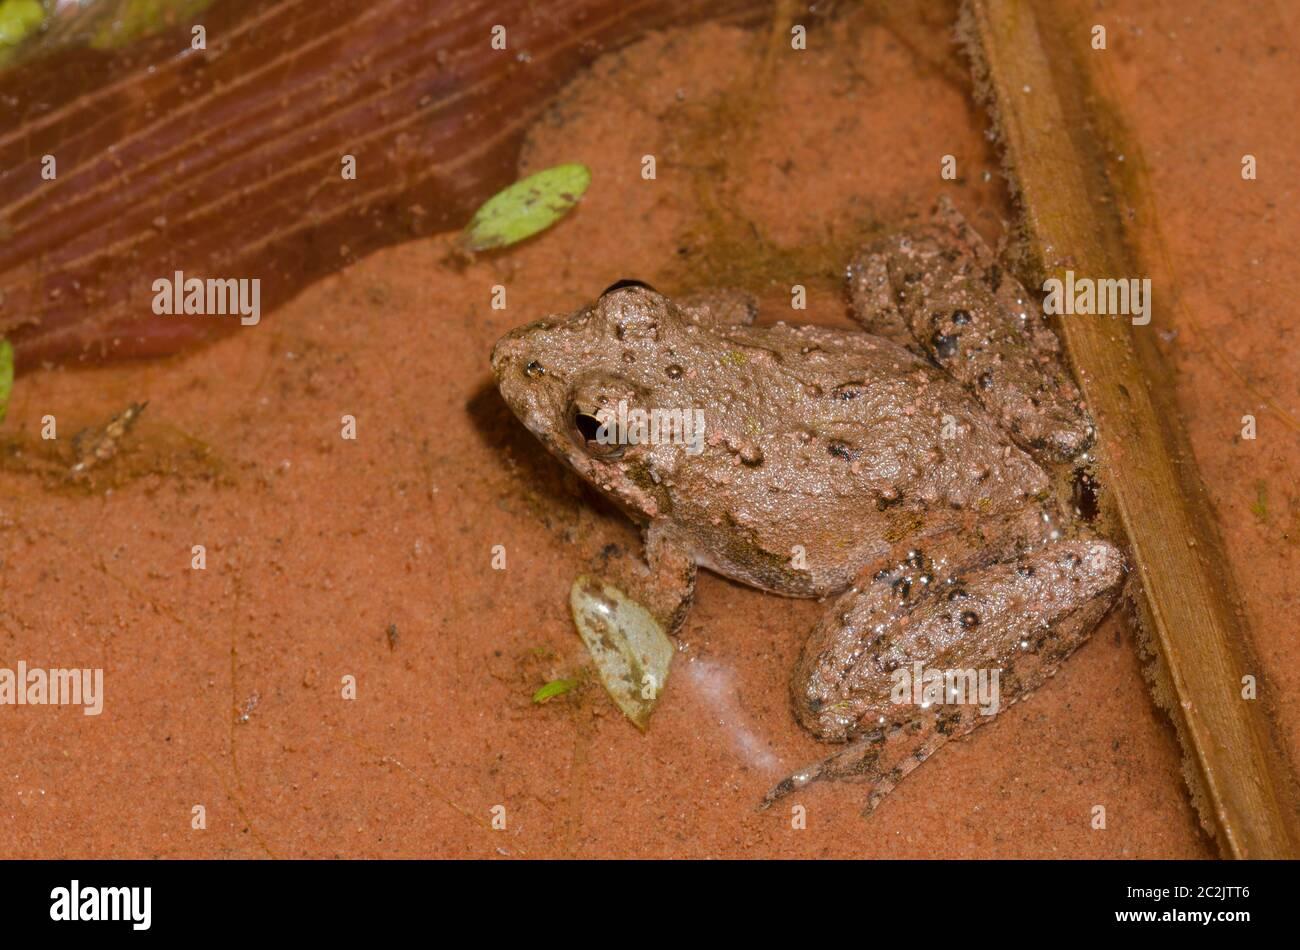 Blanchards Cricket Frosch, Acris blanchardi Stockfoto